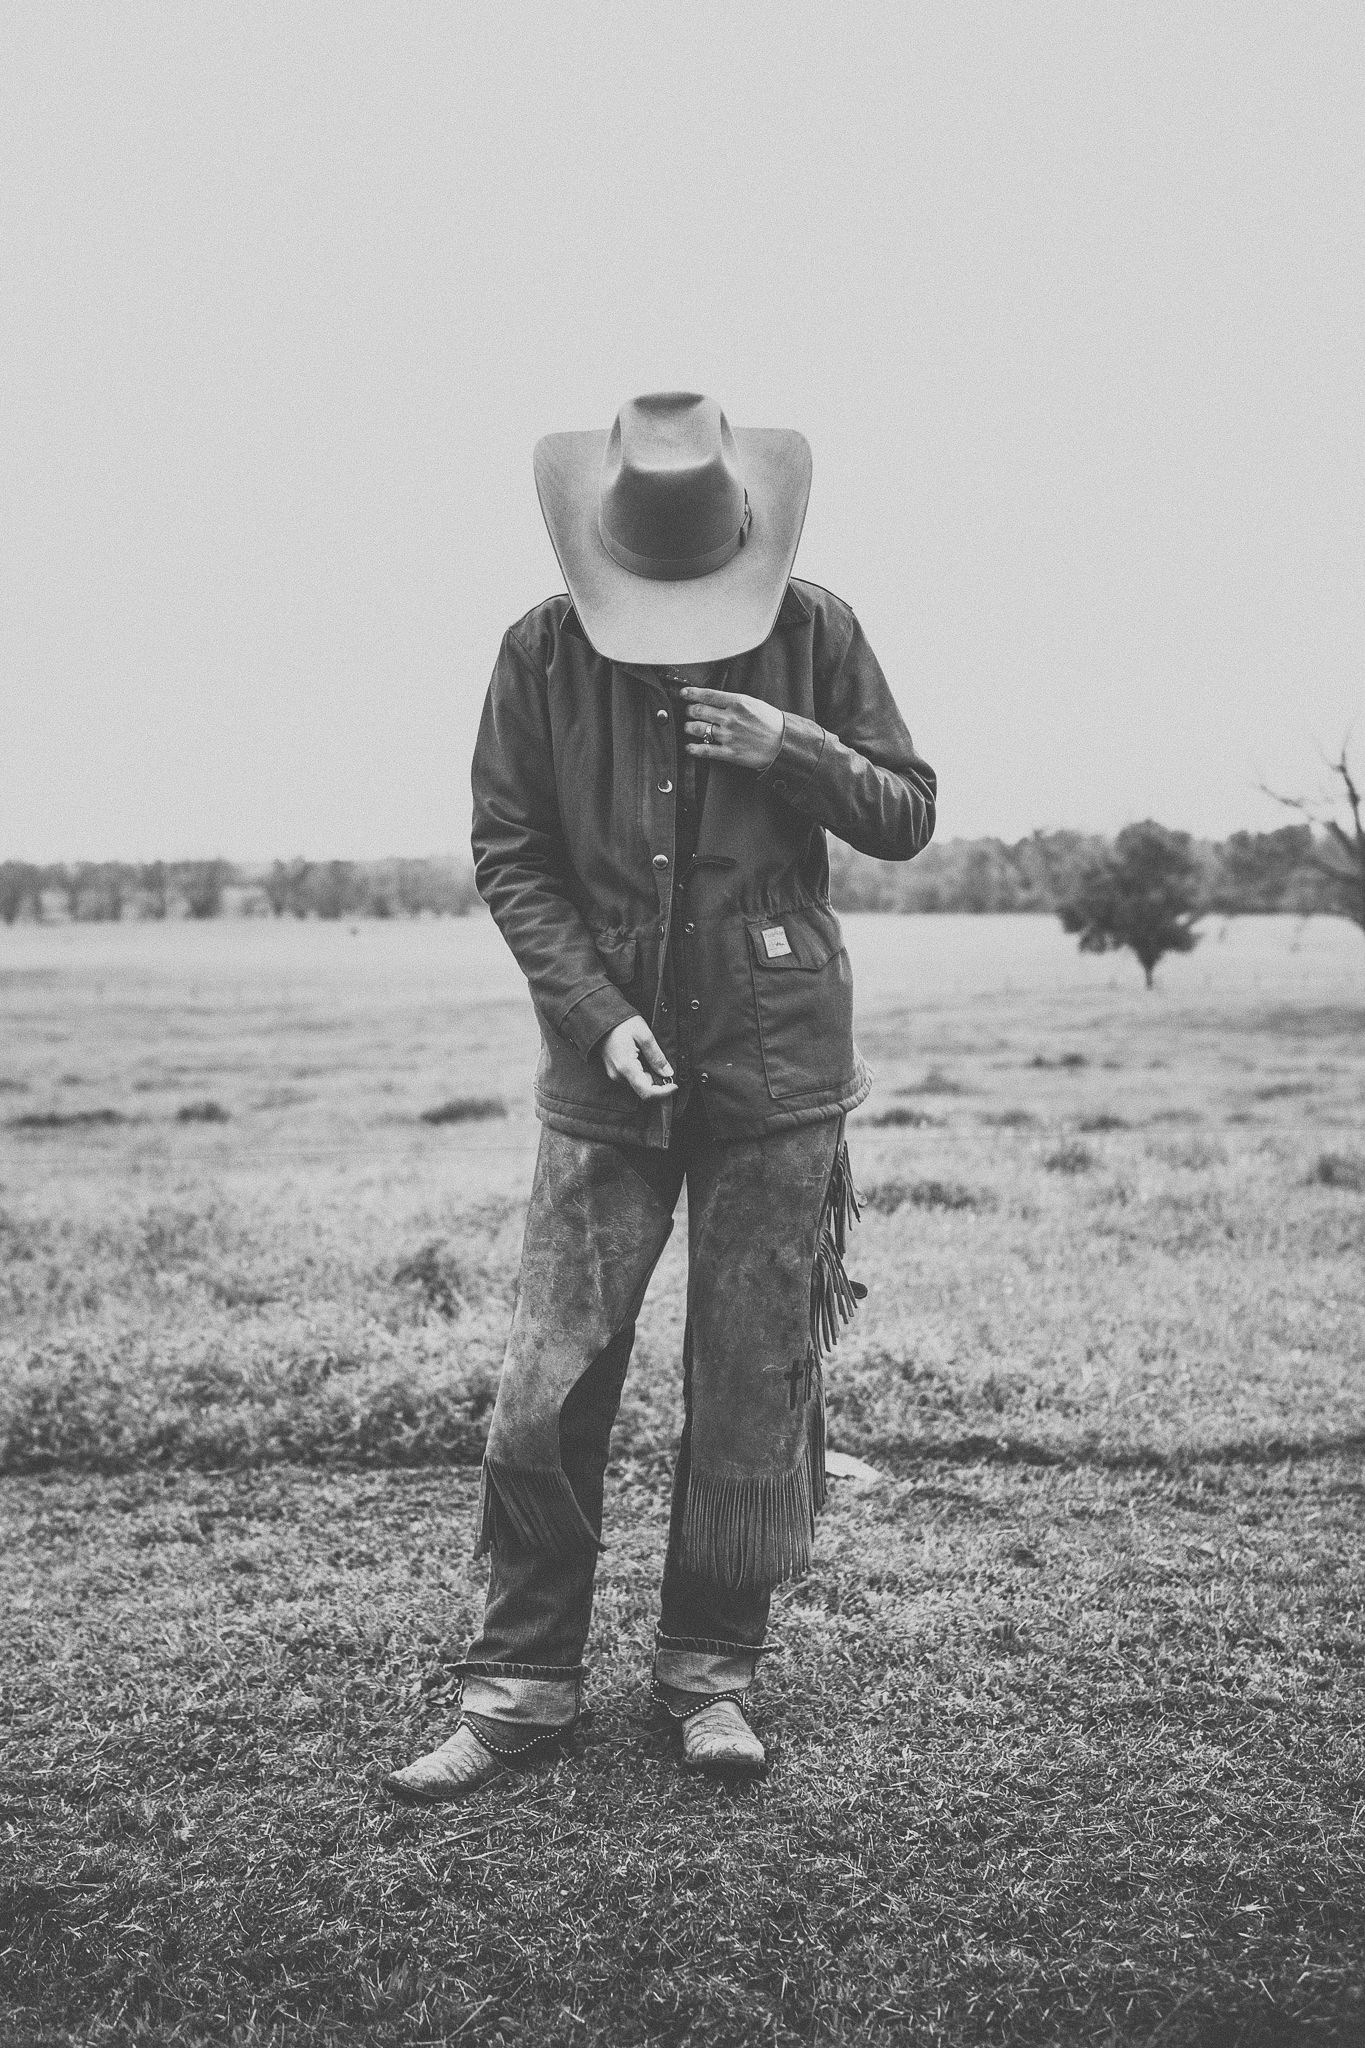 Image Title: Cowboy Way